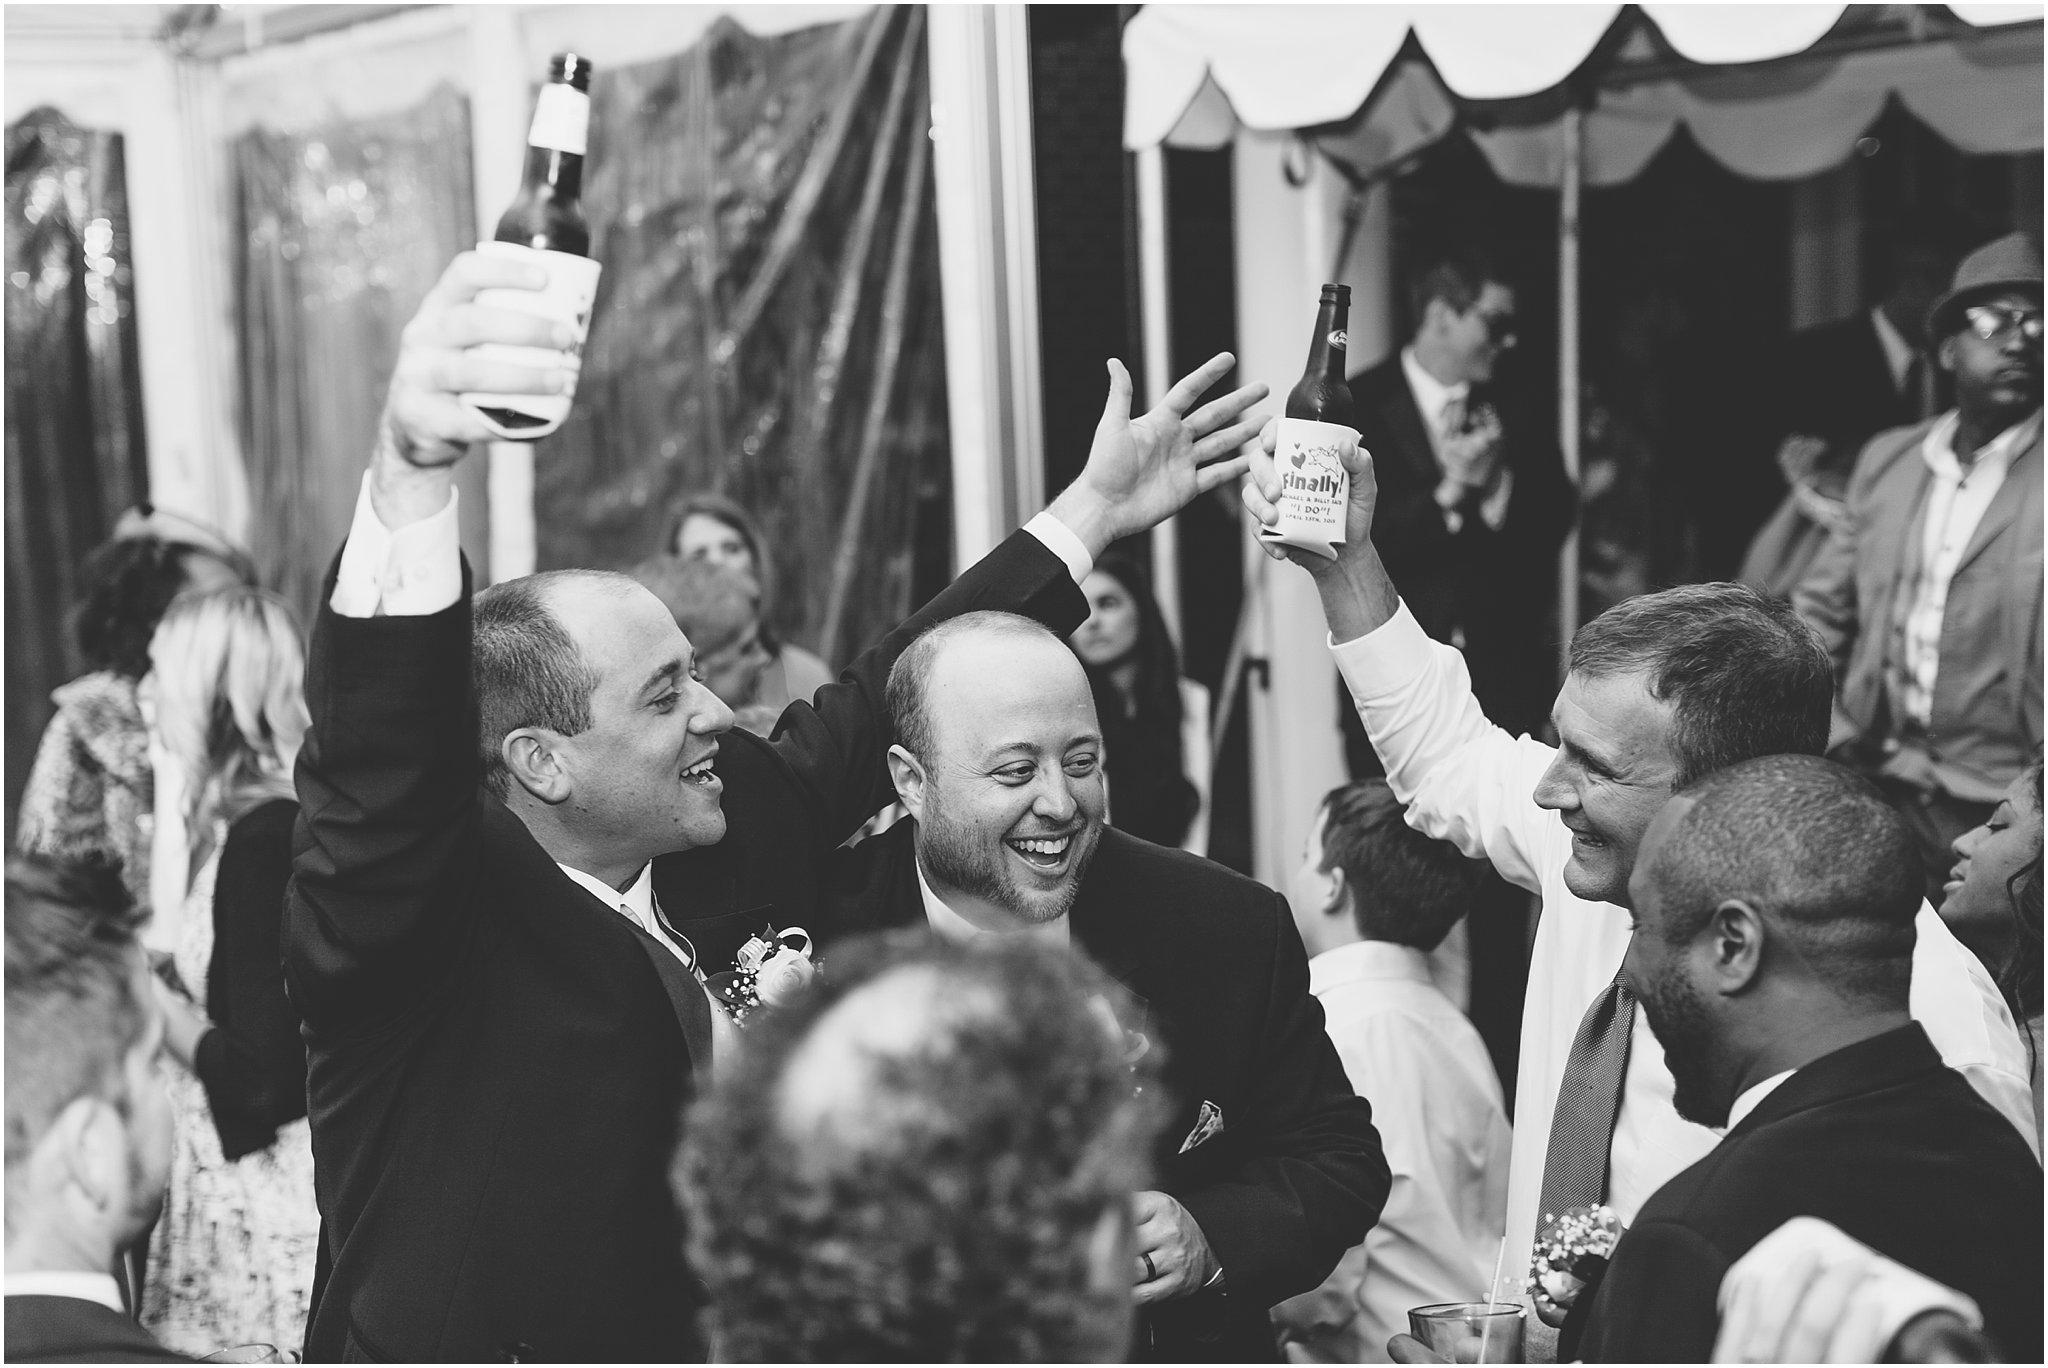 jessica_ryan_photography_wedding_hampton_roads_virginia_virginia_beach_weddings_0637